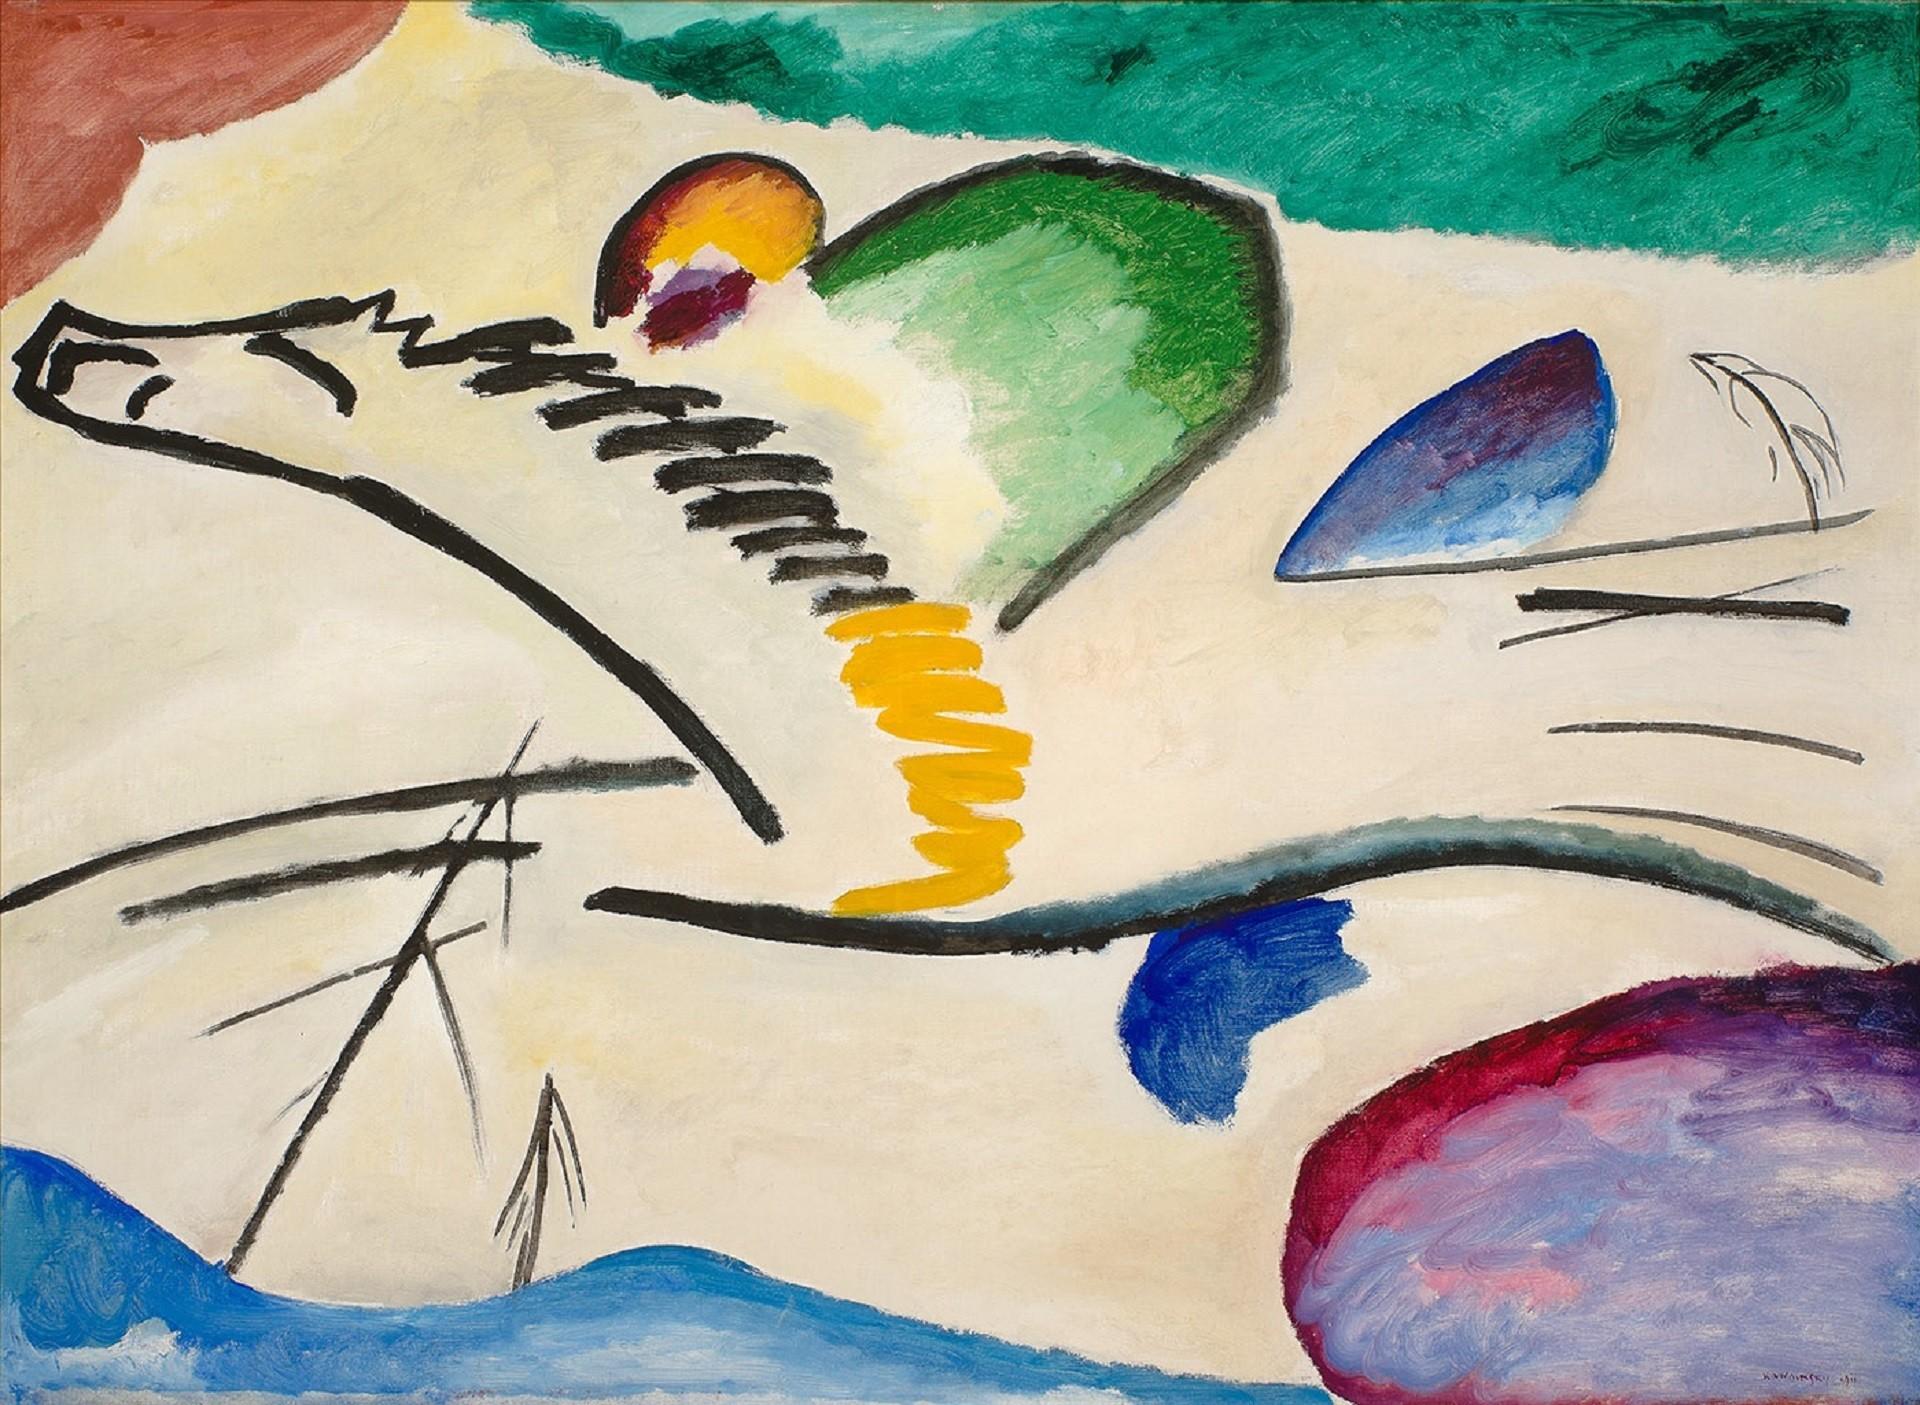 Wassily_Kandinsky,_1911,_Reiter_(Lyrishes),_oil_on_canvas,_94_x_130_cm,_Museum_Boijmans_Van_Beuningen